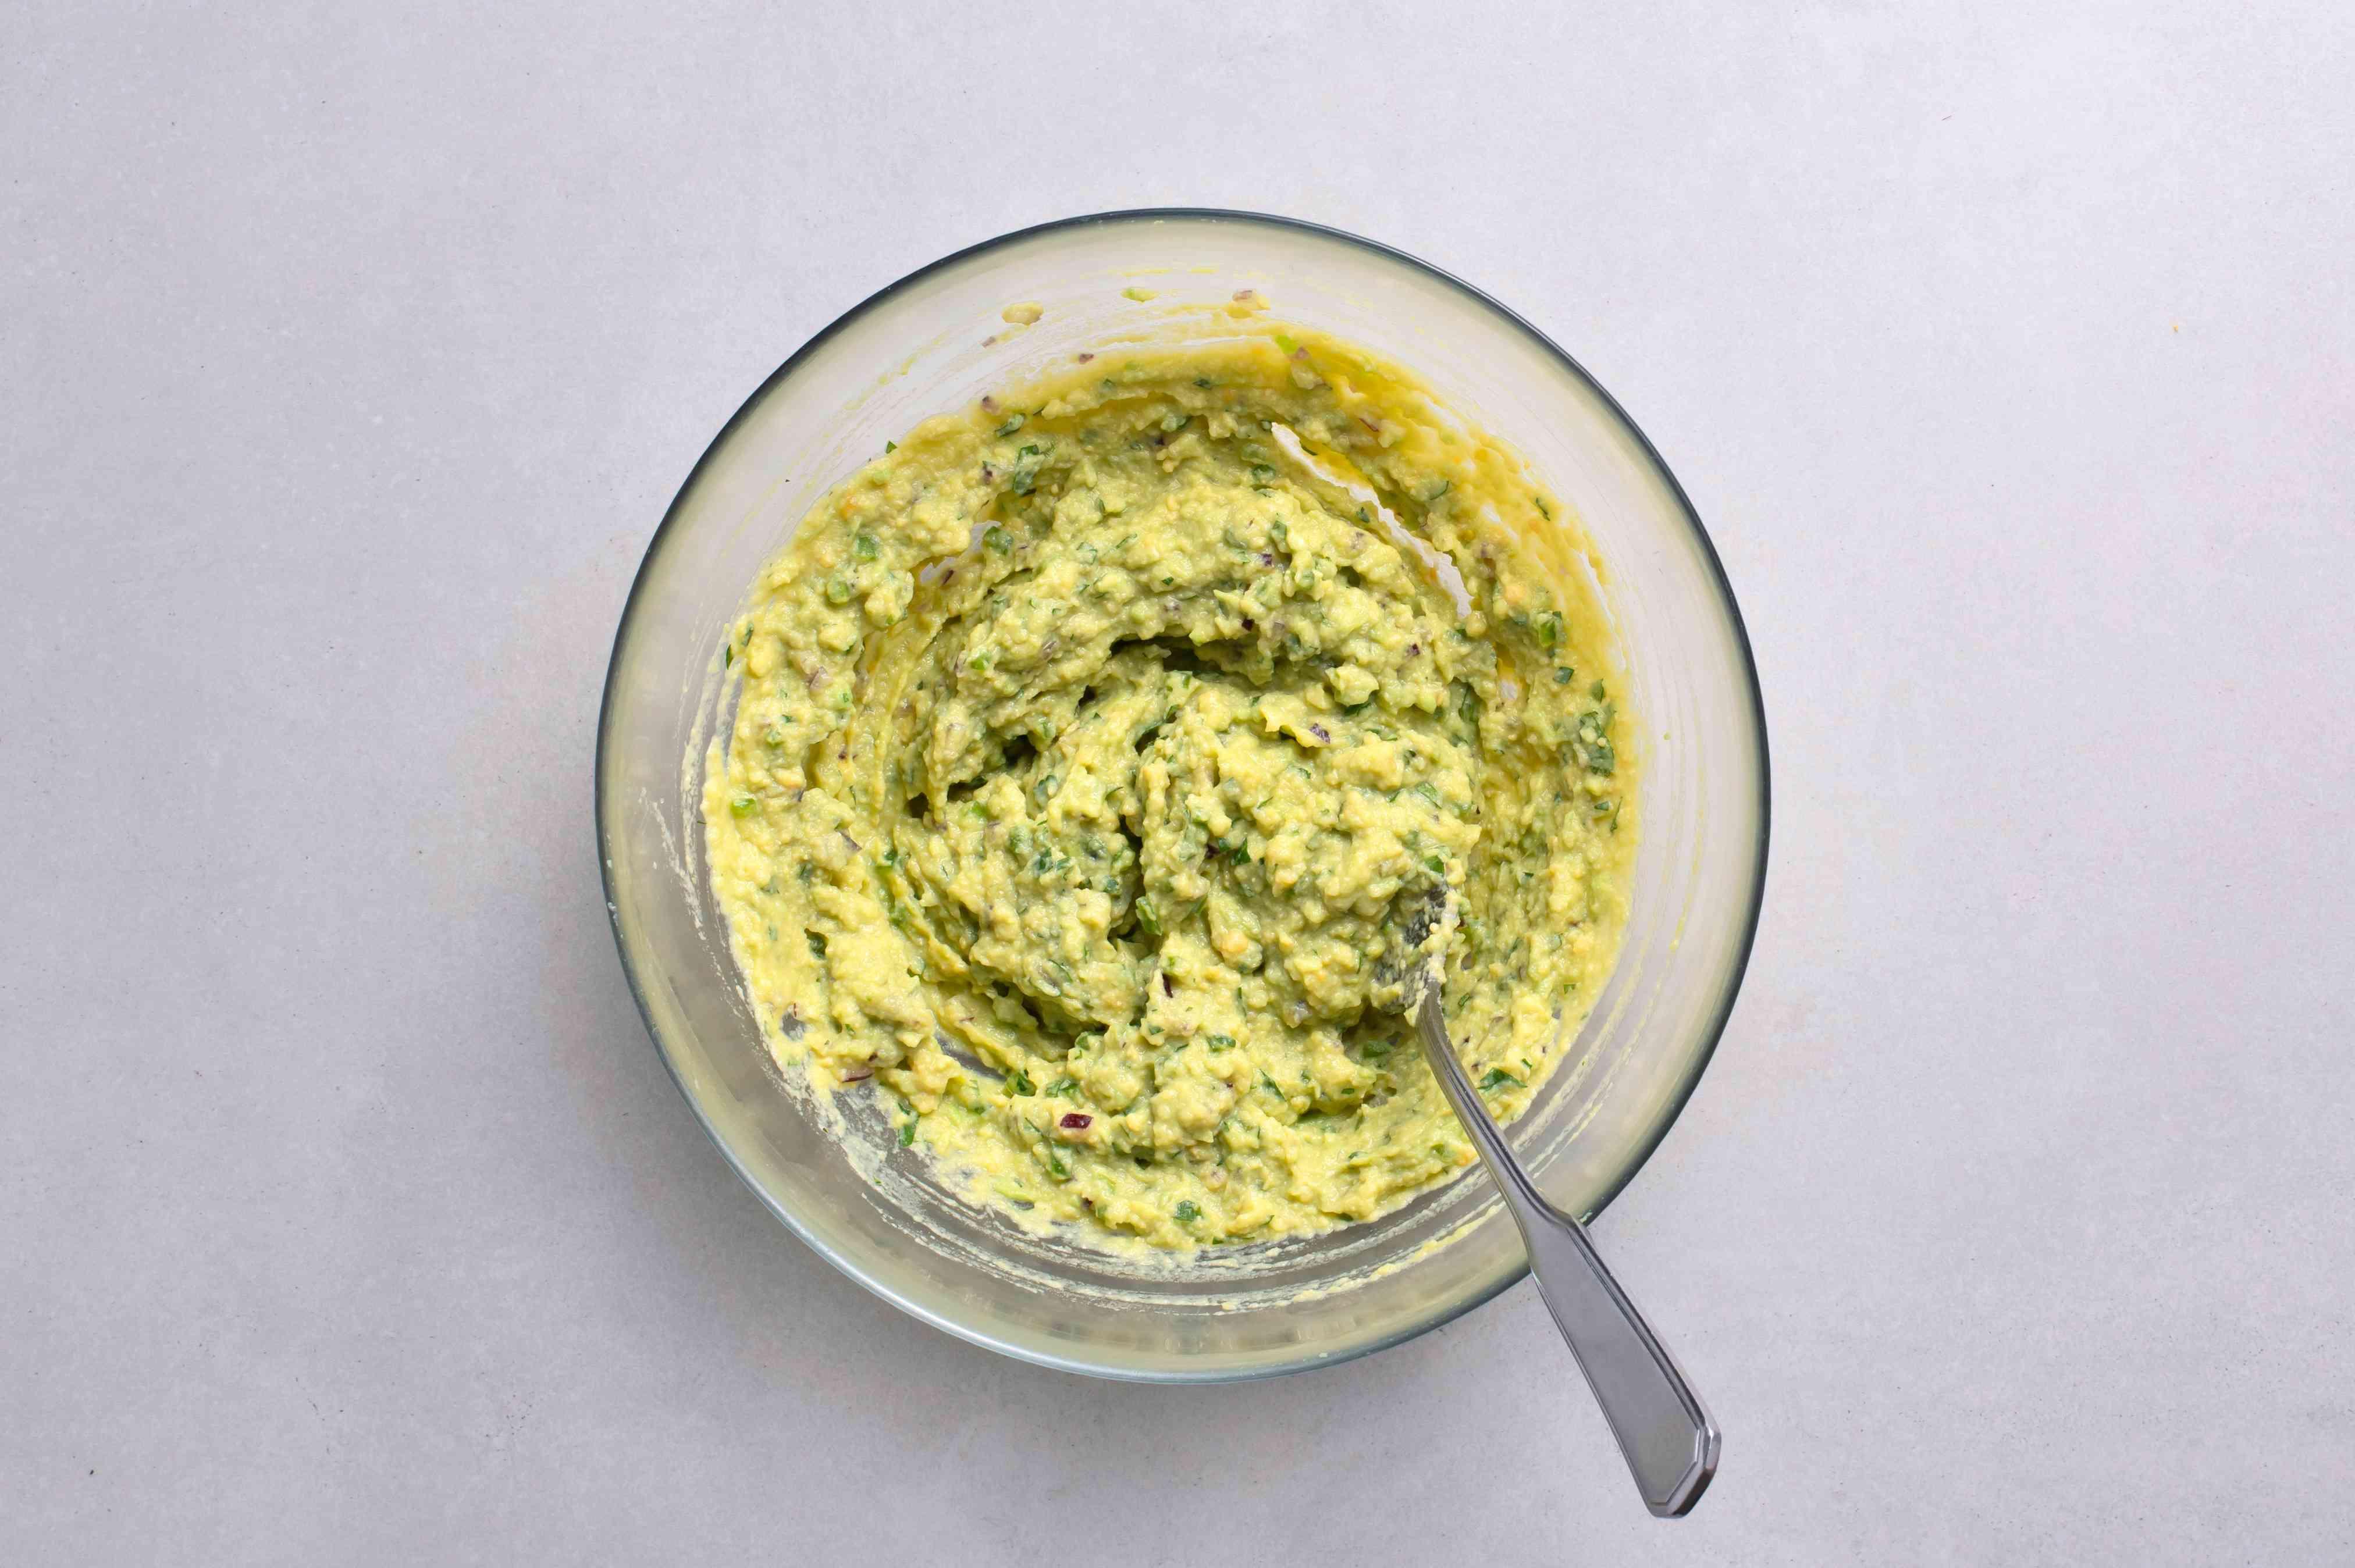 Add the mashed egg yolks, cilantro, onion, jalapeño (if using), garlic, lime juice, and salt to the mashed avocado